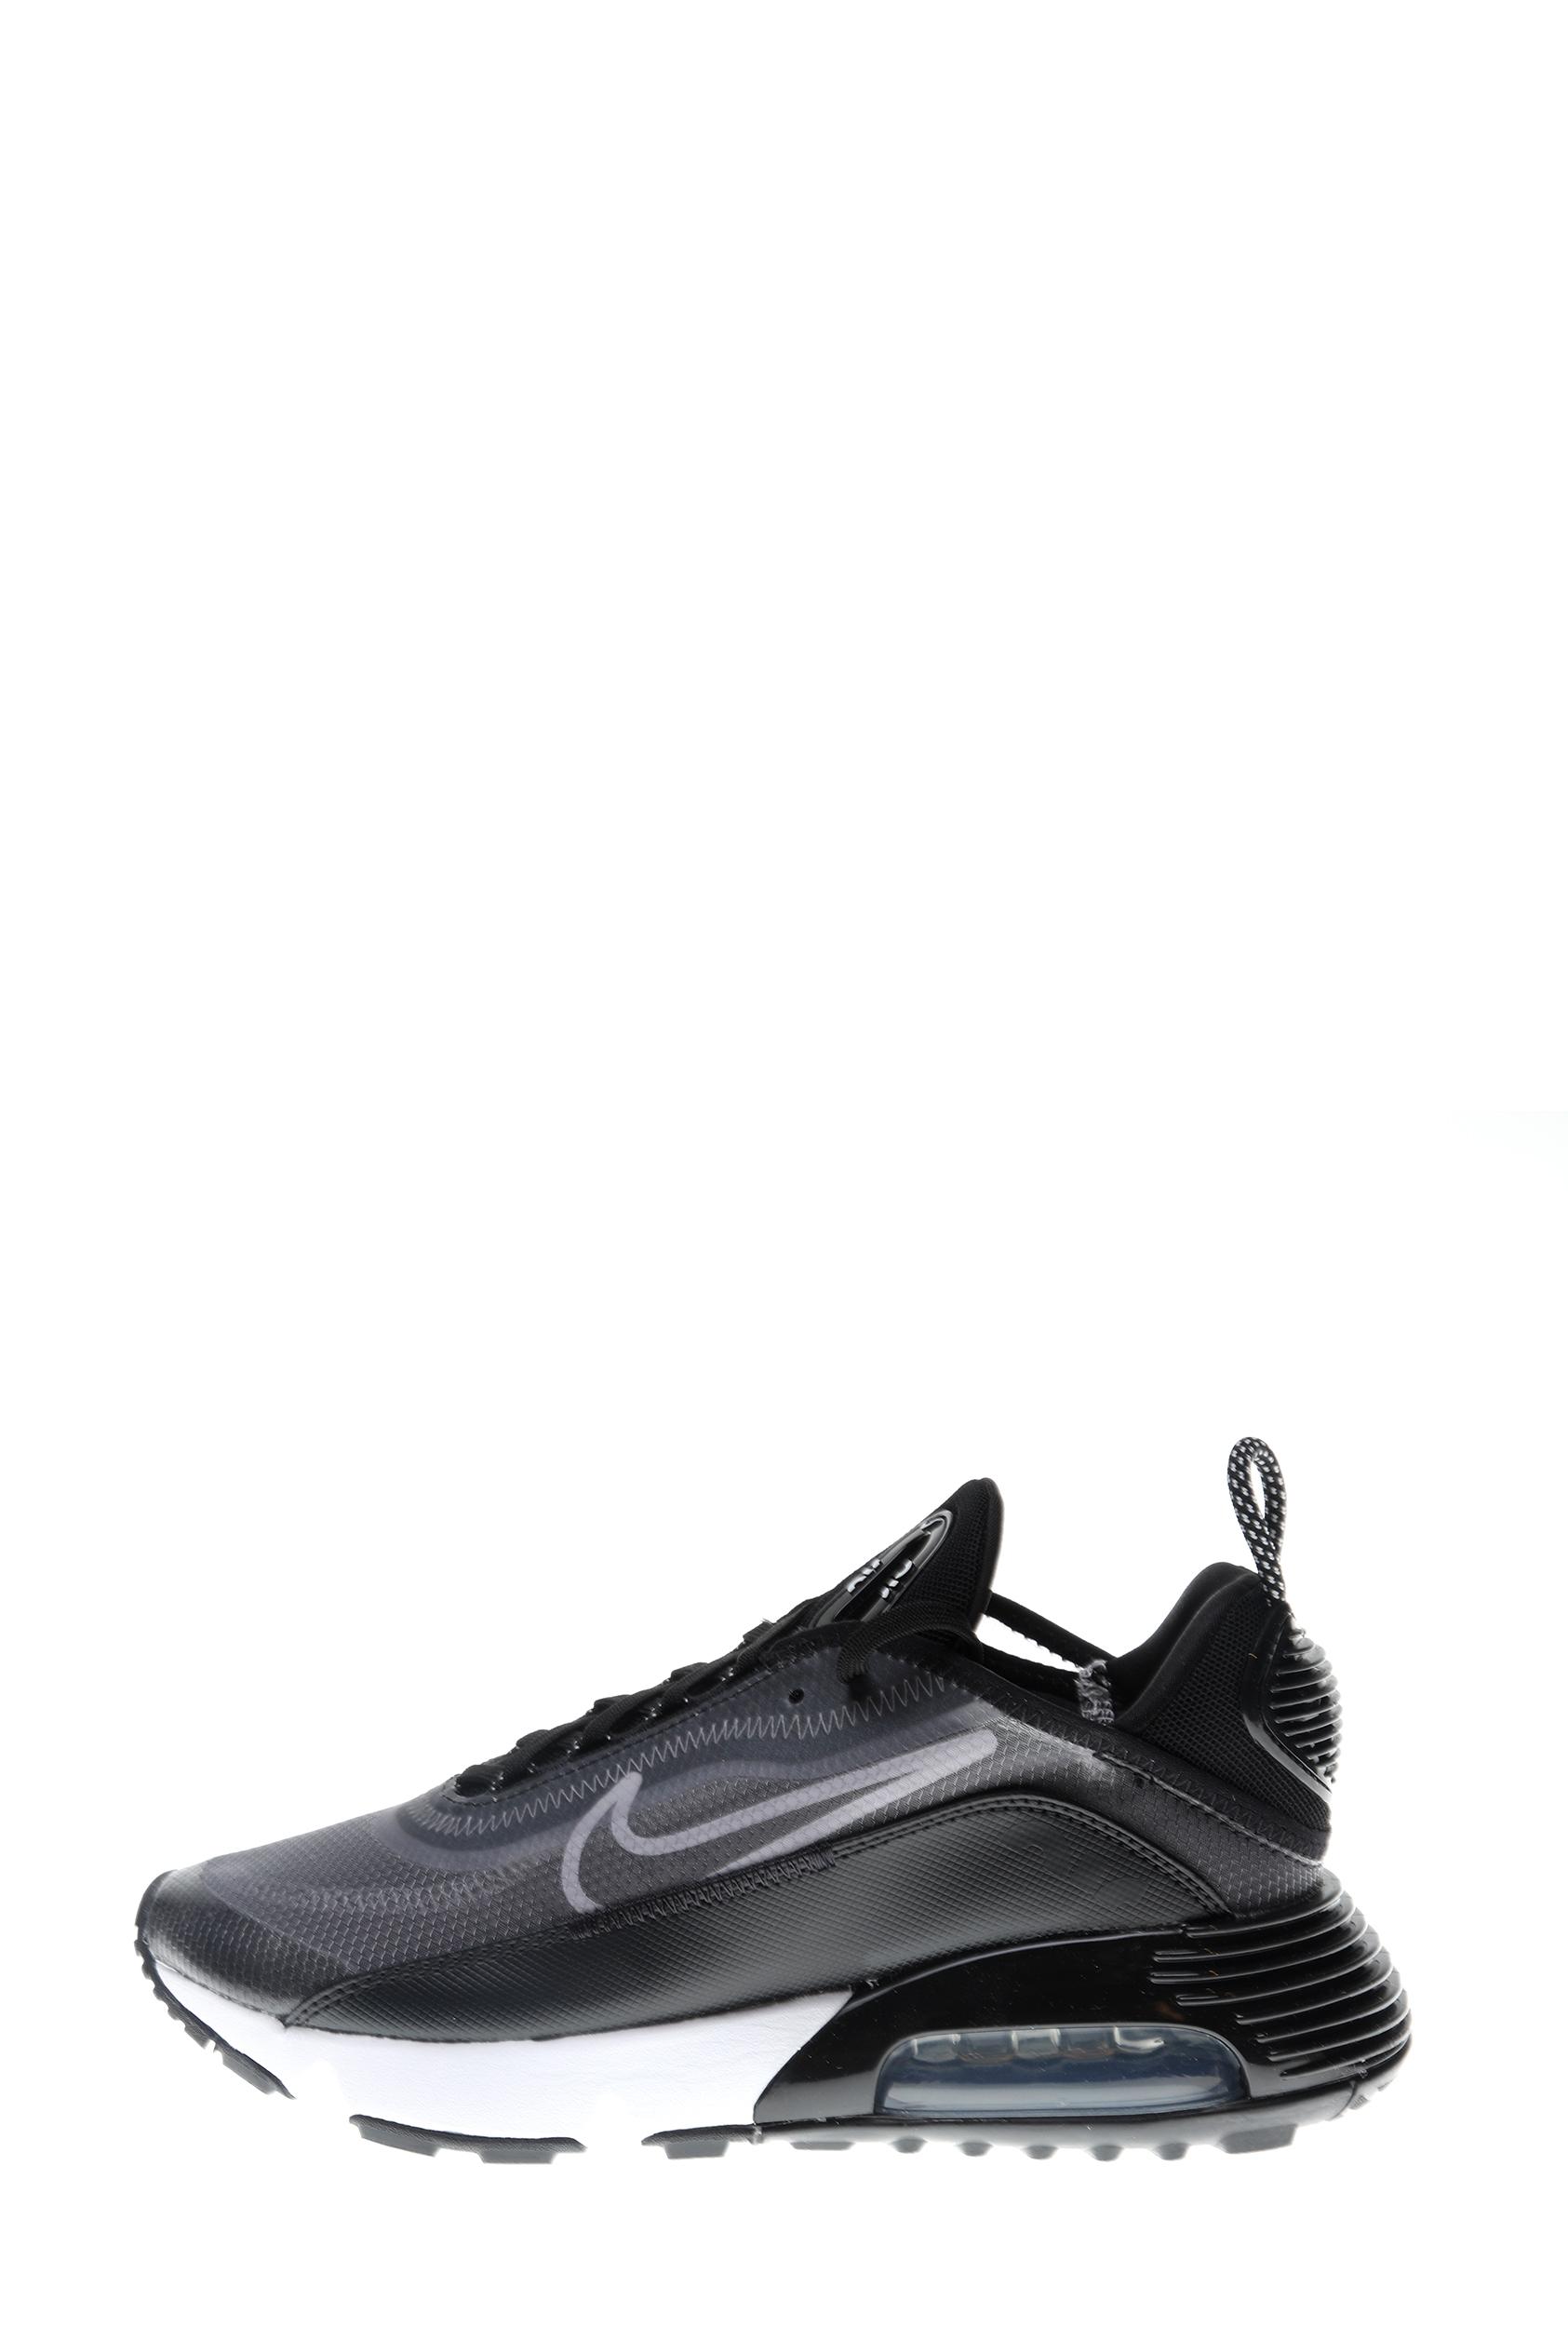 NIKE – Γυναικείο παπούτσι NIKE AIR MAX 2090 μαύρο